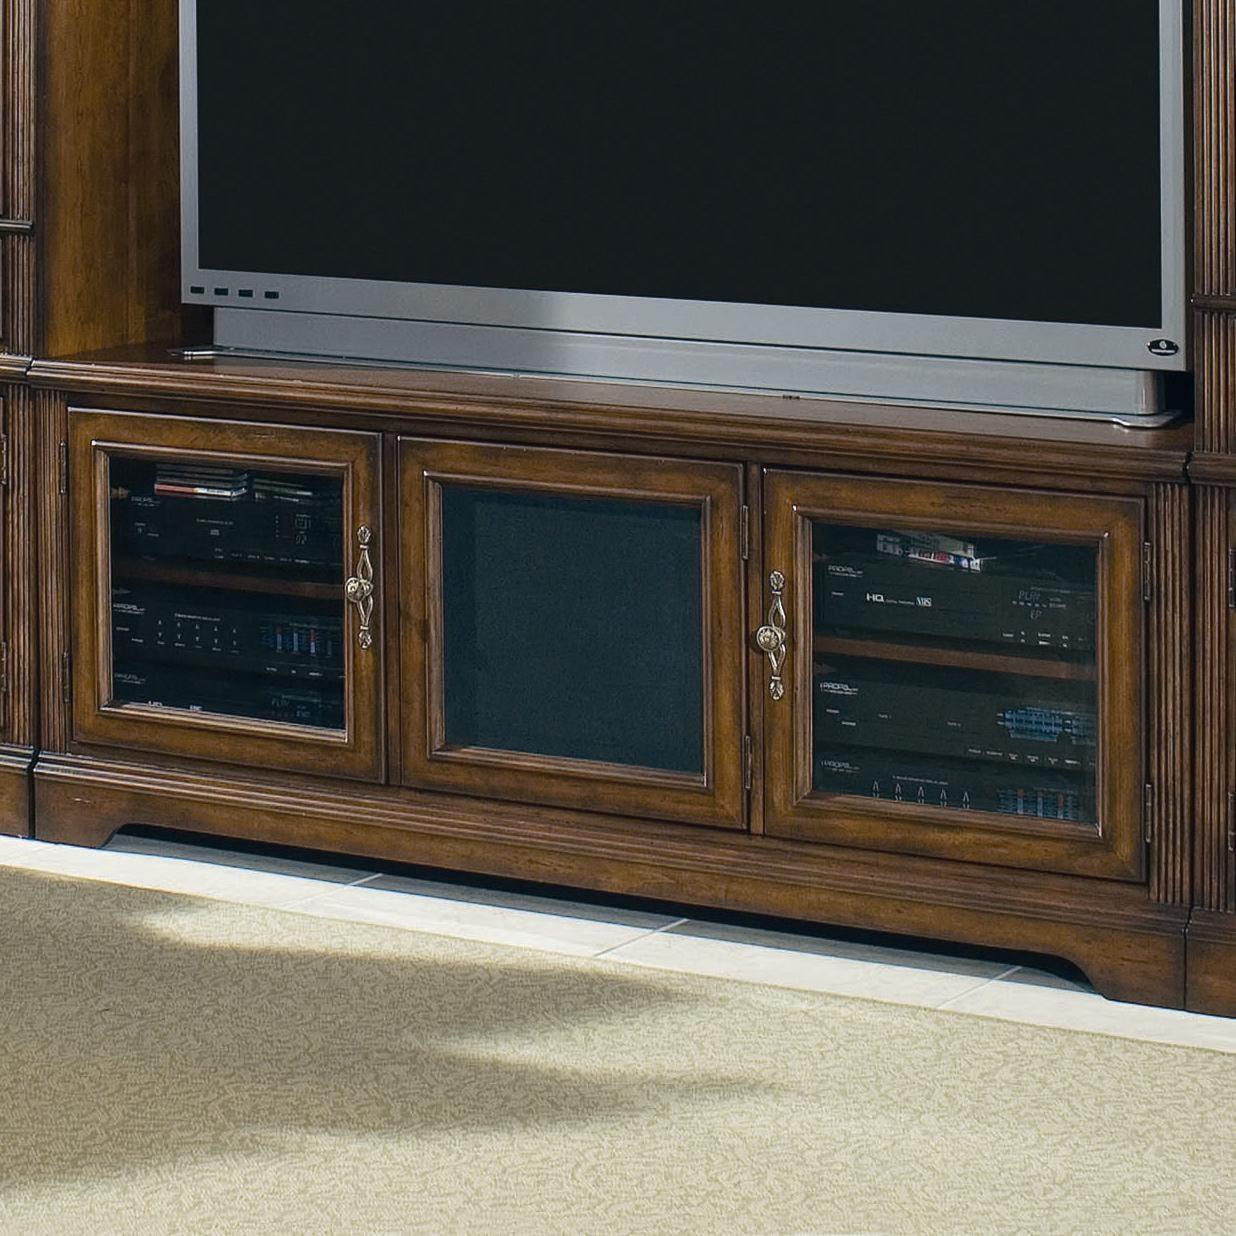 hooker furniture entertainment center. Hooker Furniture BrookhavenTV Console Entertainment Center